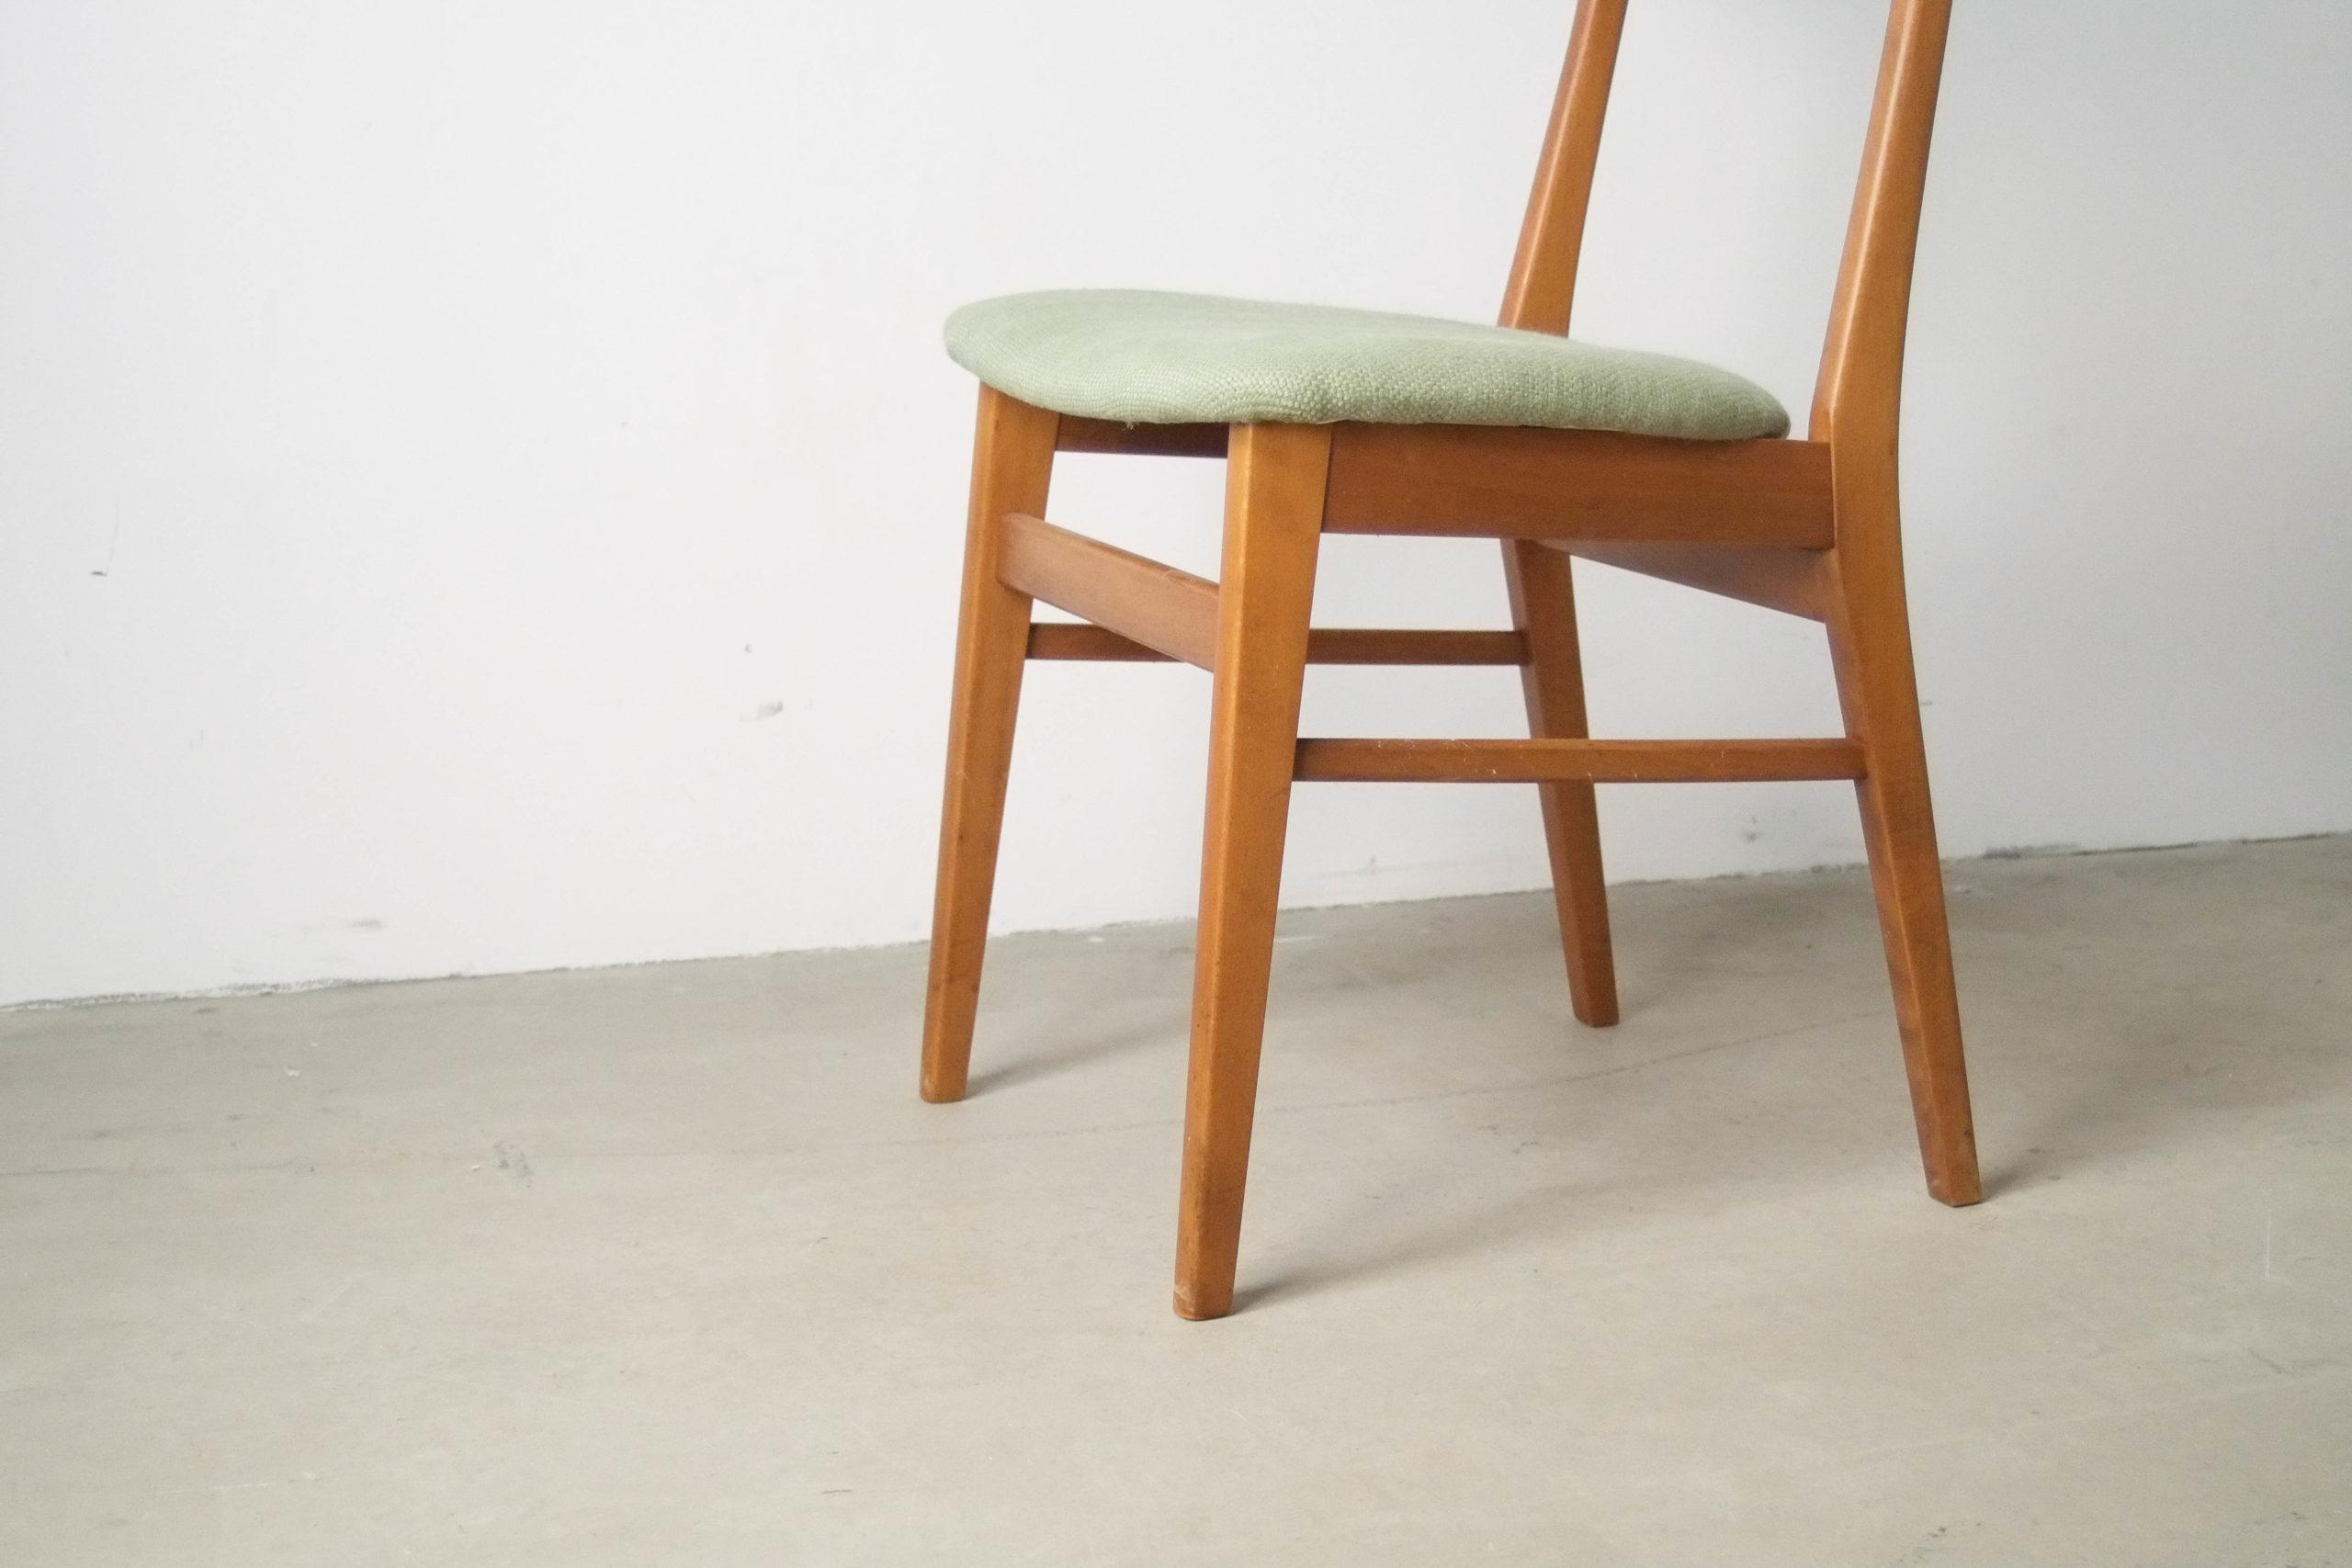 silla farstrup teca madera verde vintage retro comedor